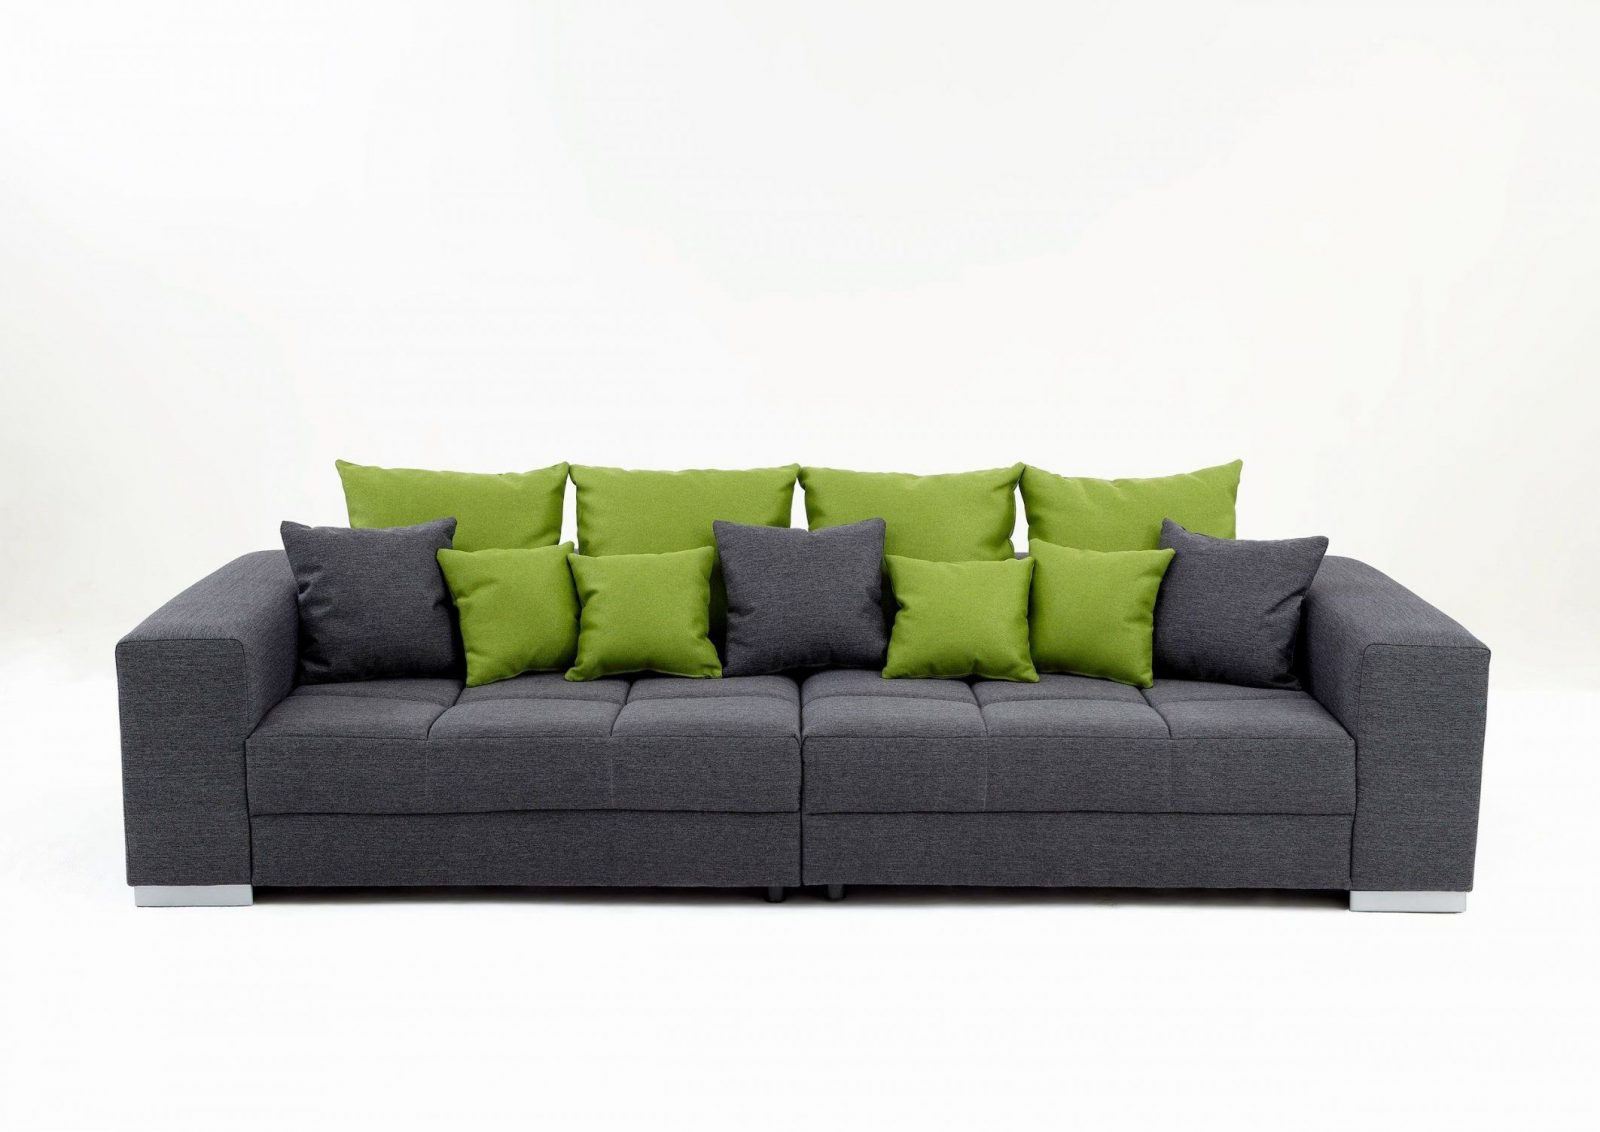 Miniküche Mit Kühlschrank Möbel Boss : Big sofa swing stoffbezug graugrün ca cm möbel boss